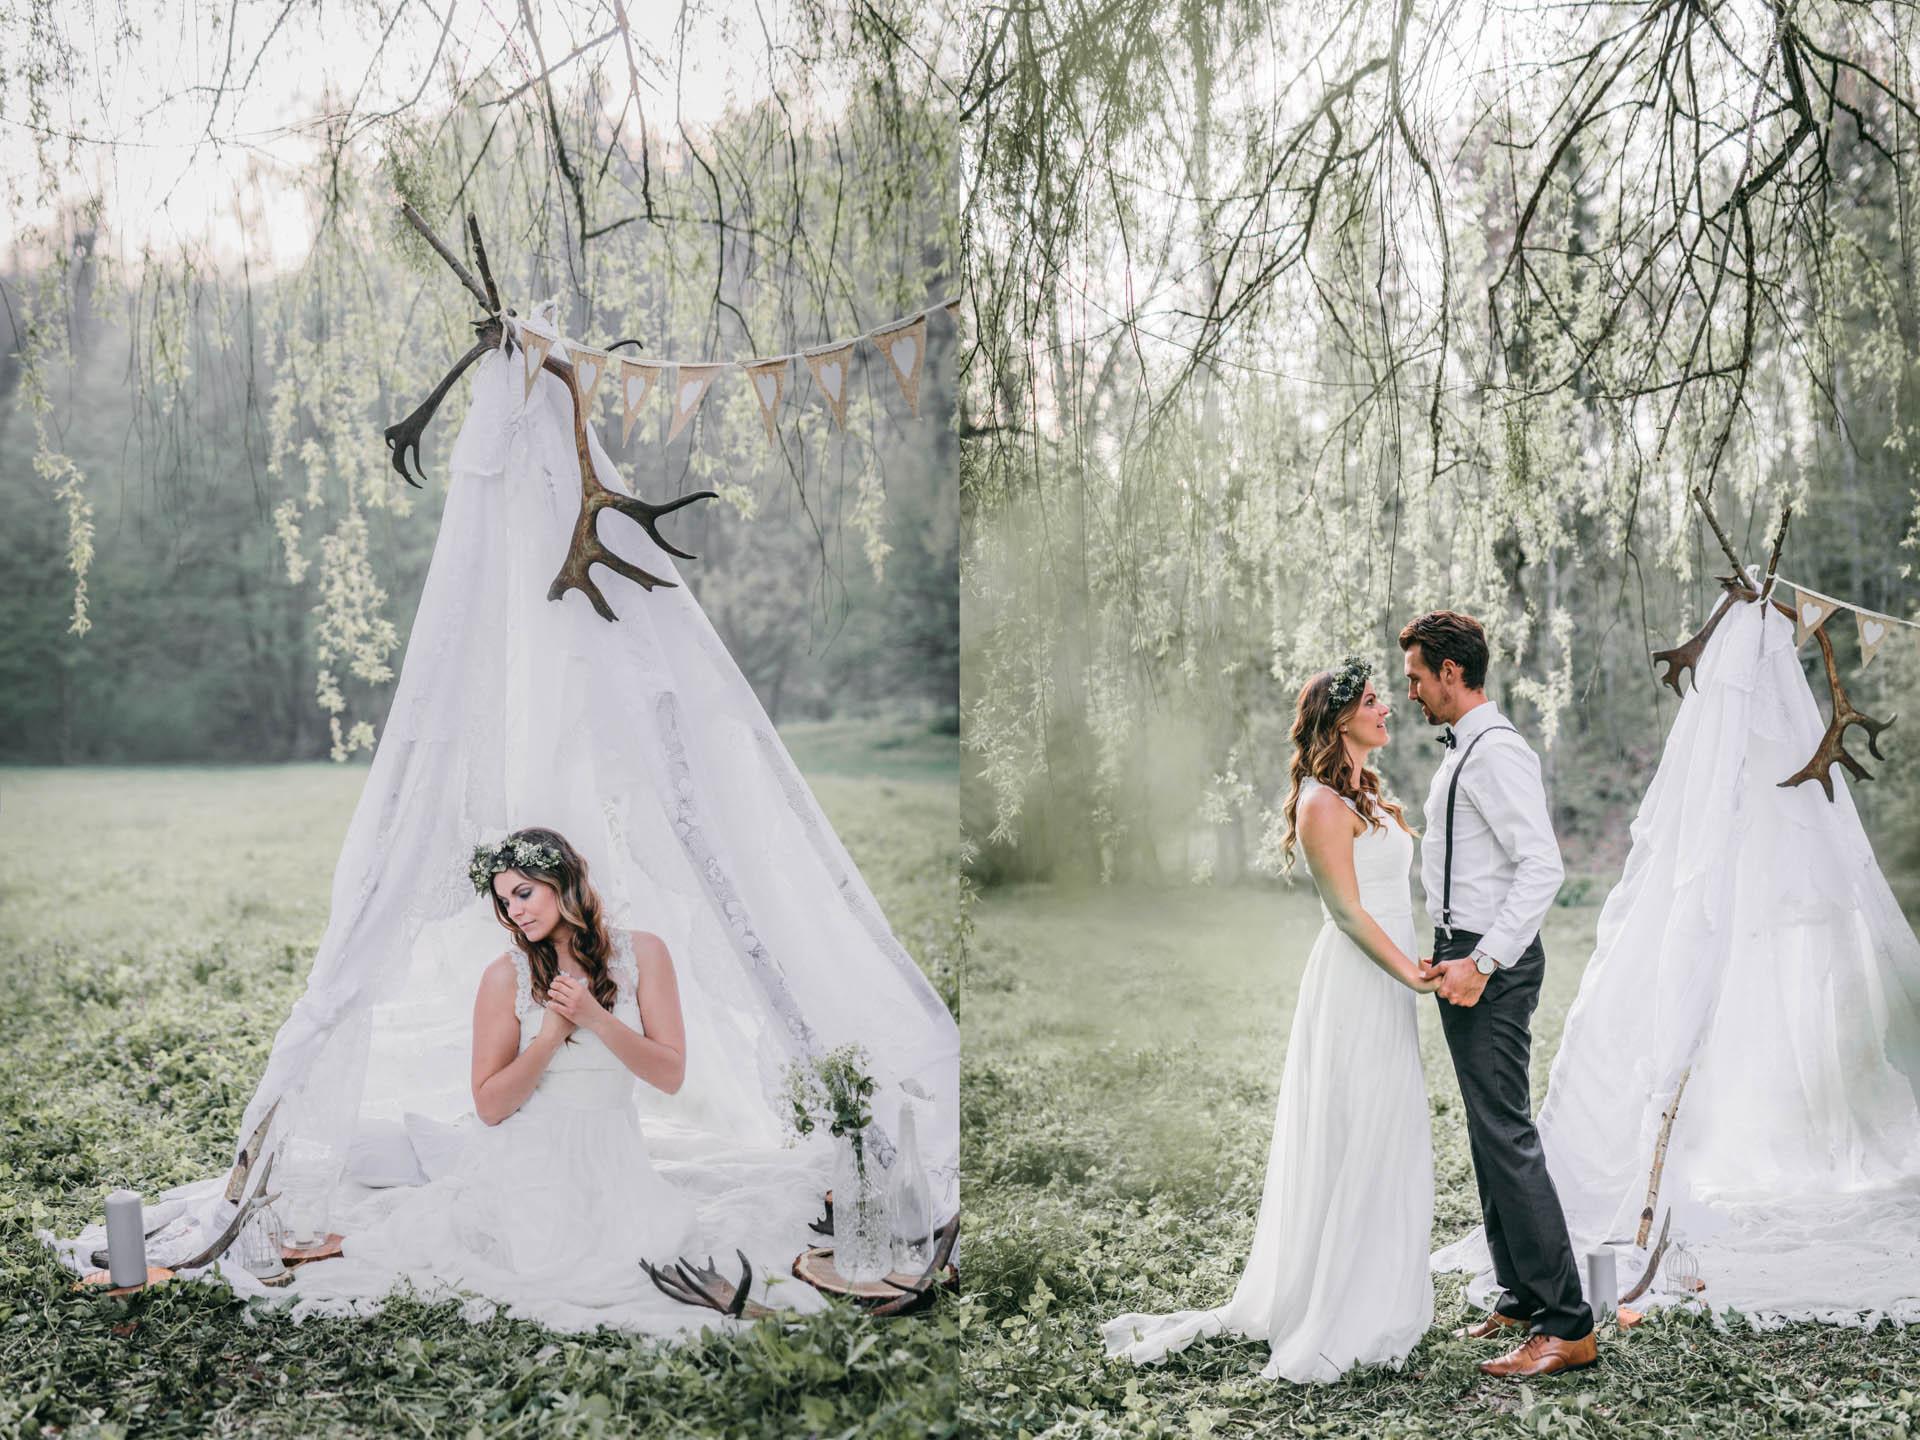 Boho Brautpaar vor dem Tipi